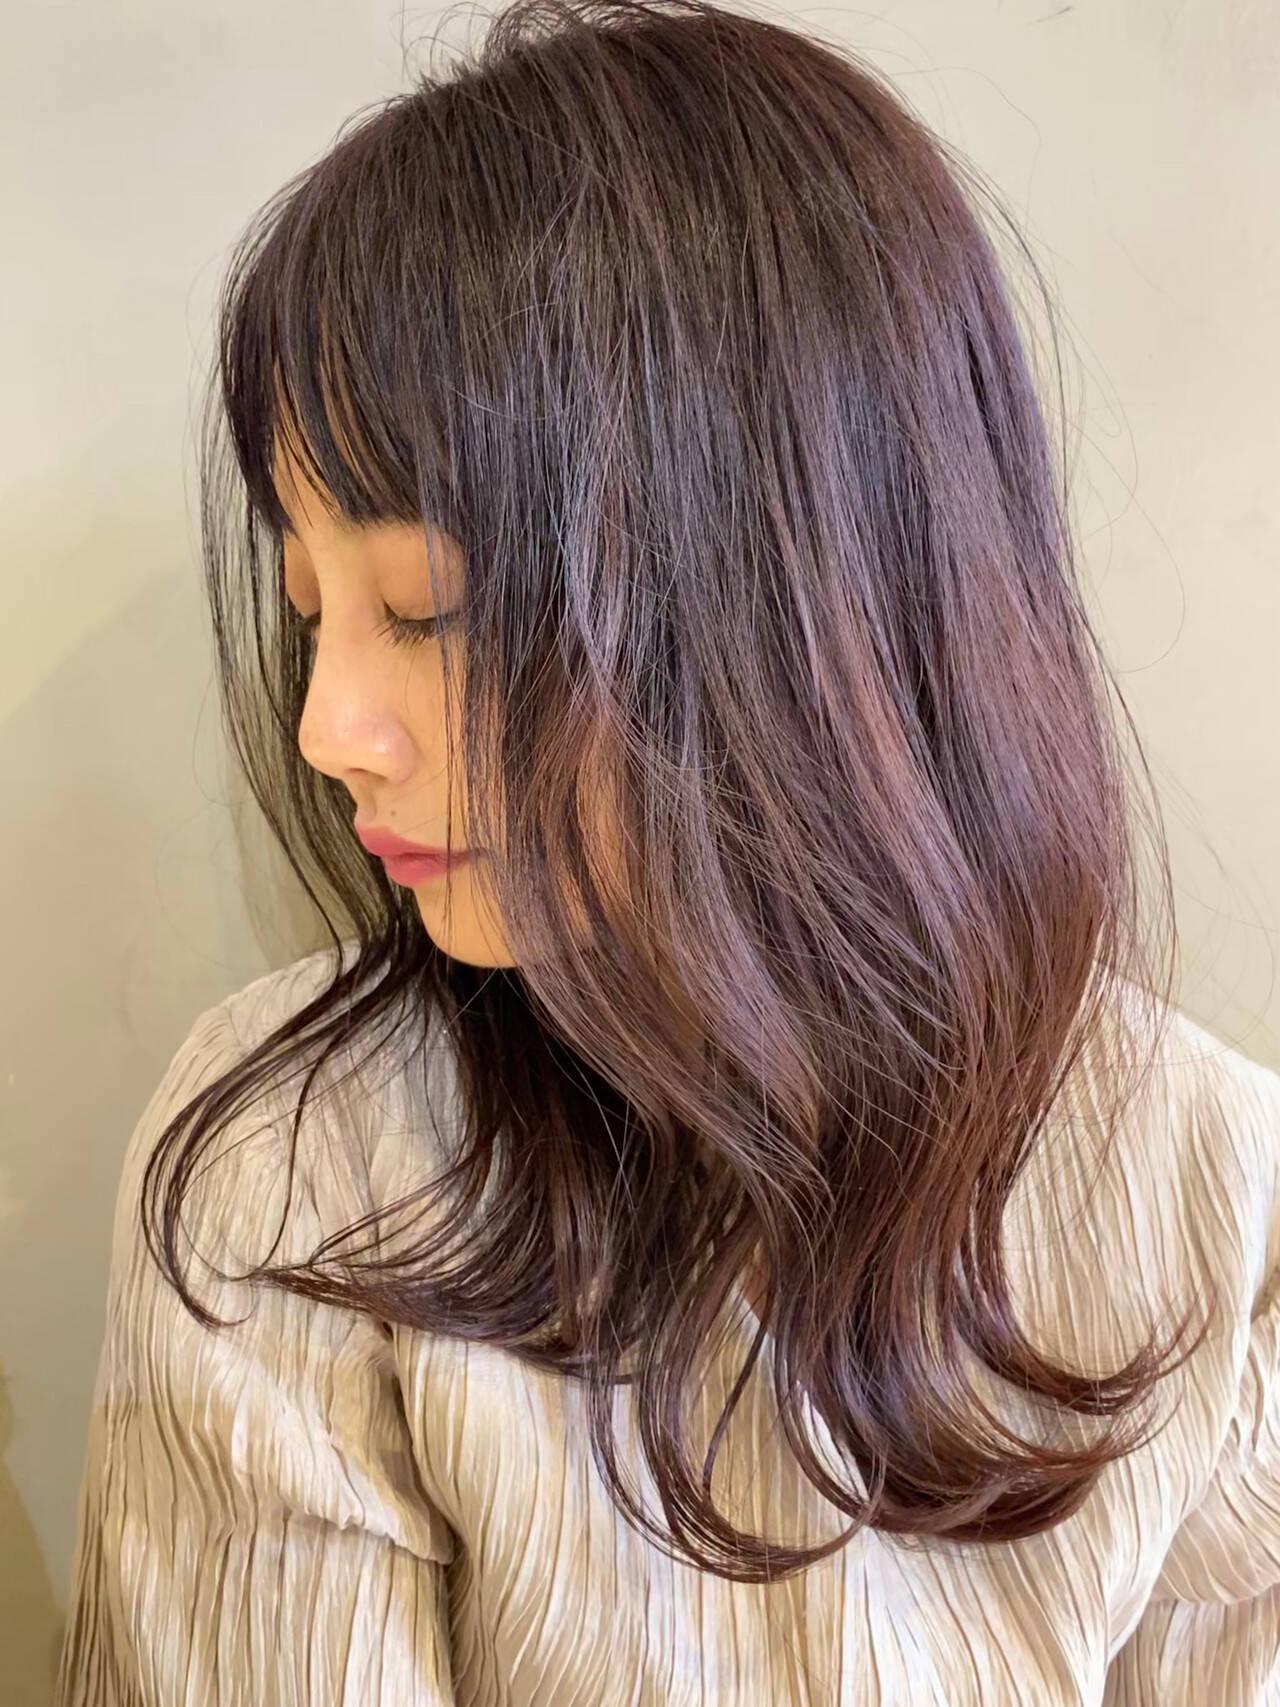 oggiotto ミディアム 大人可愛い ナチュラルヘアスタイルや髪型の写真・画像